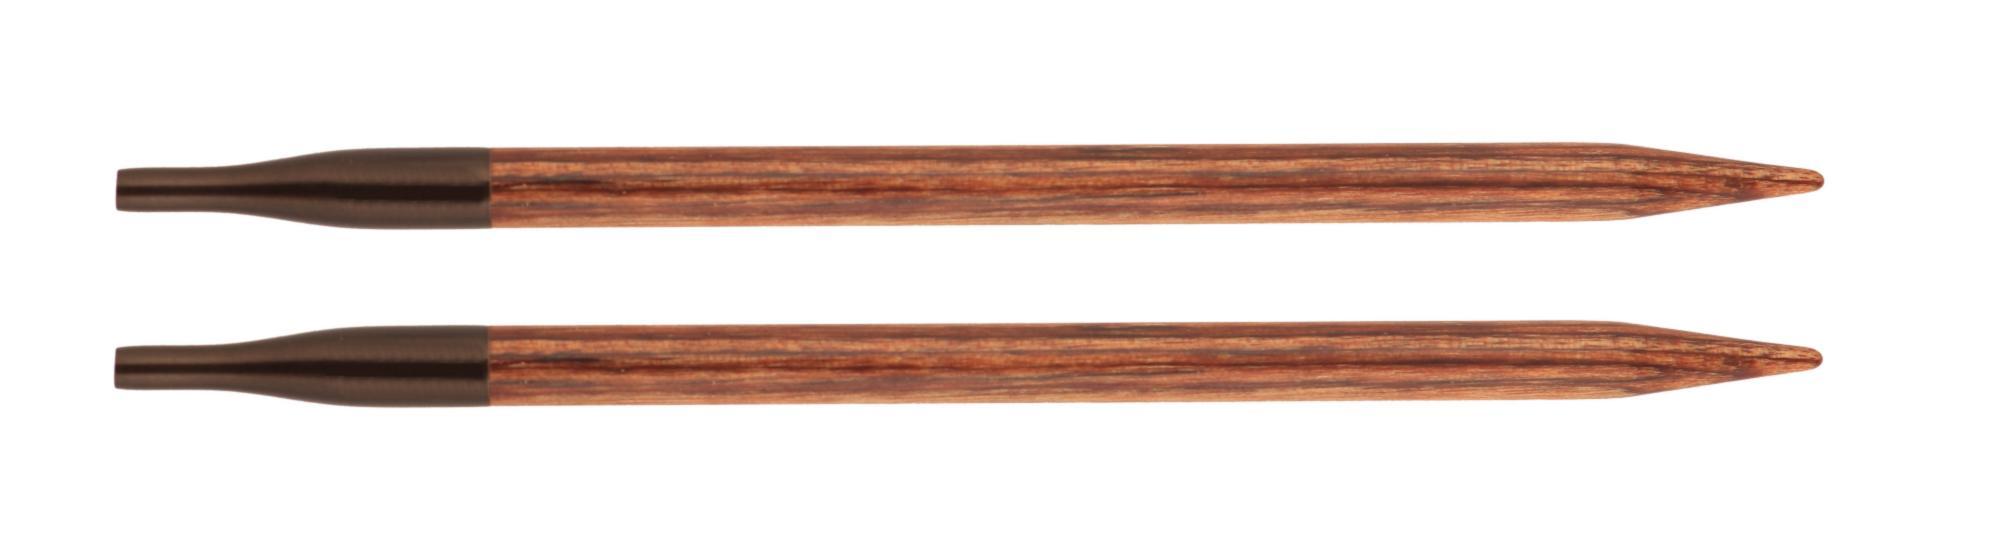 31206 Спицы съемные 4.50 мм Ginger KnitPro